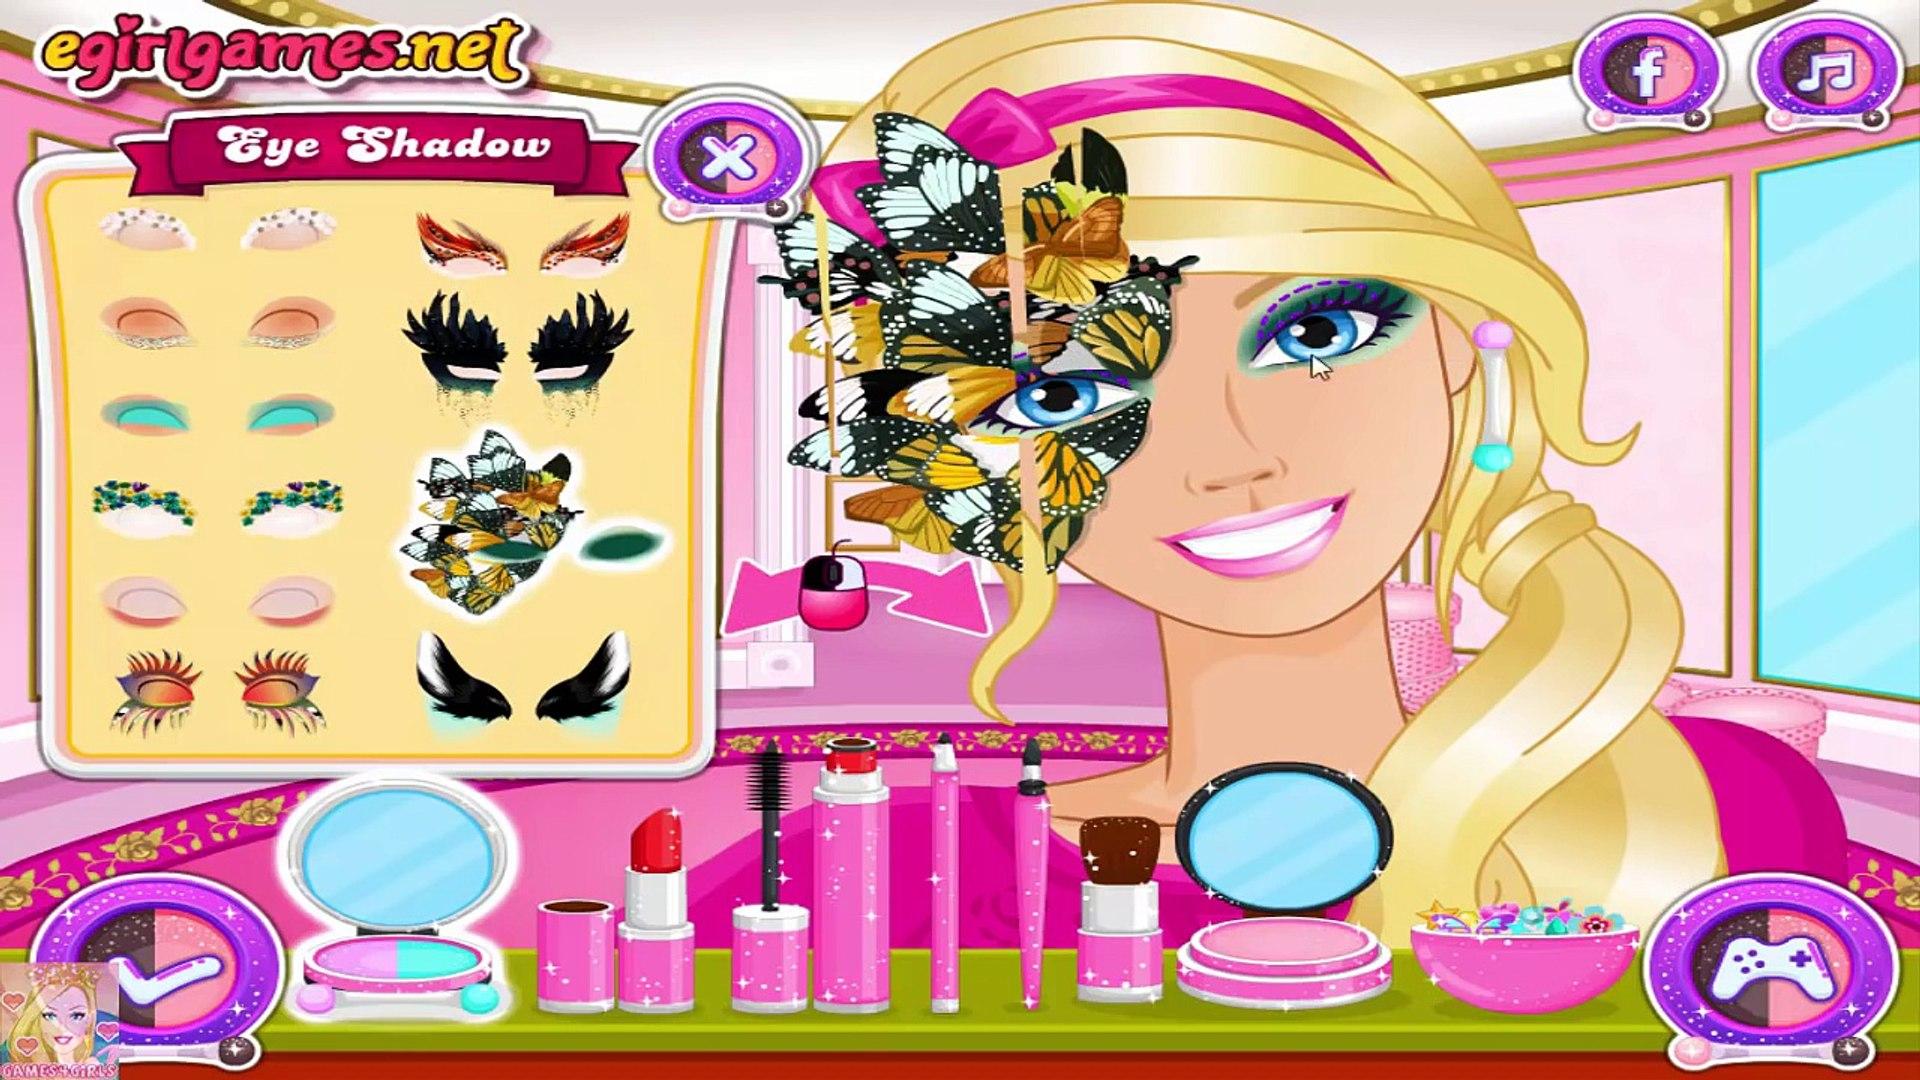 Barbie Conture Makeup - Barbie Dress Up And Makeup Game for Girls